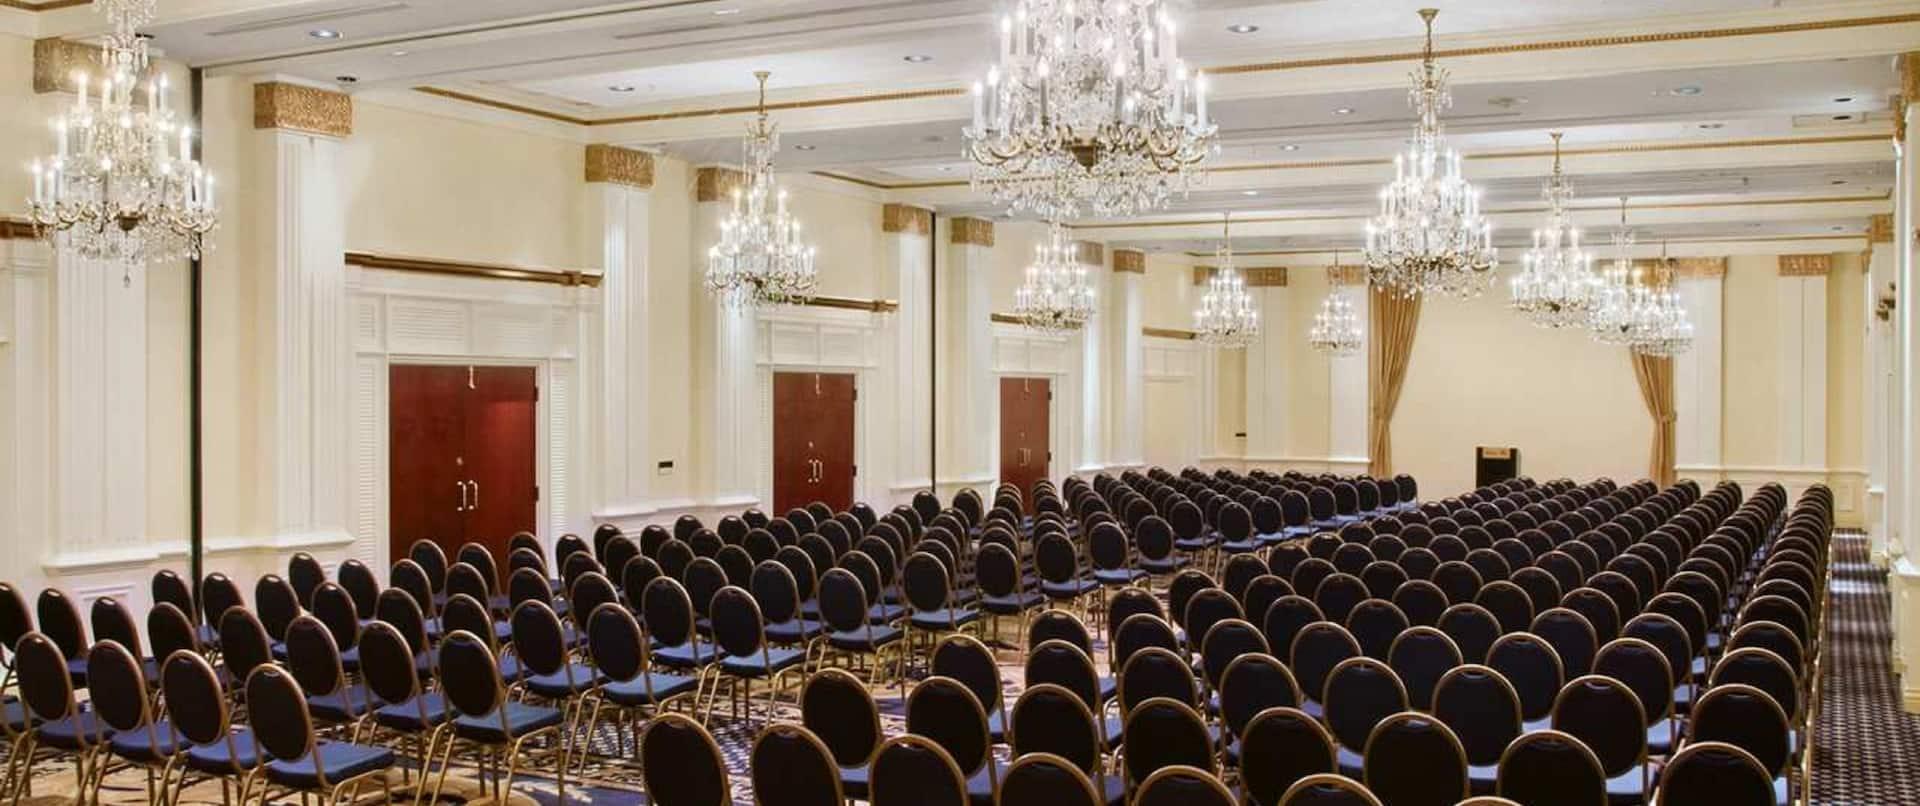 Spacious Ballroom Area with Rows of Seats